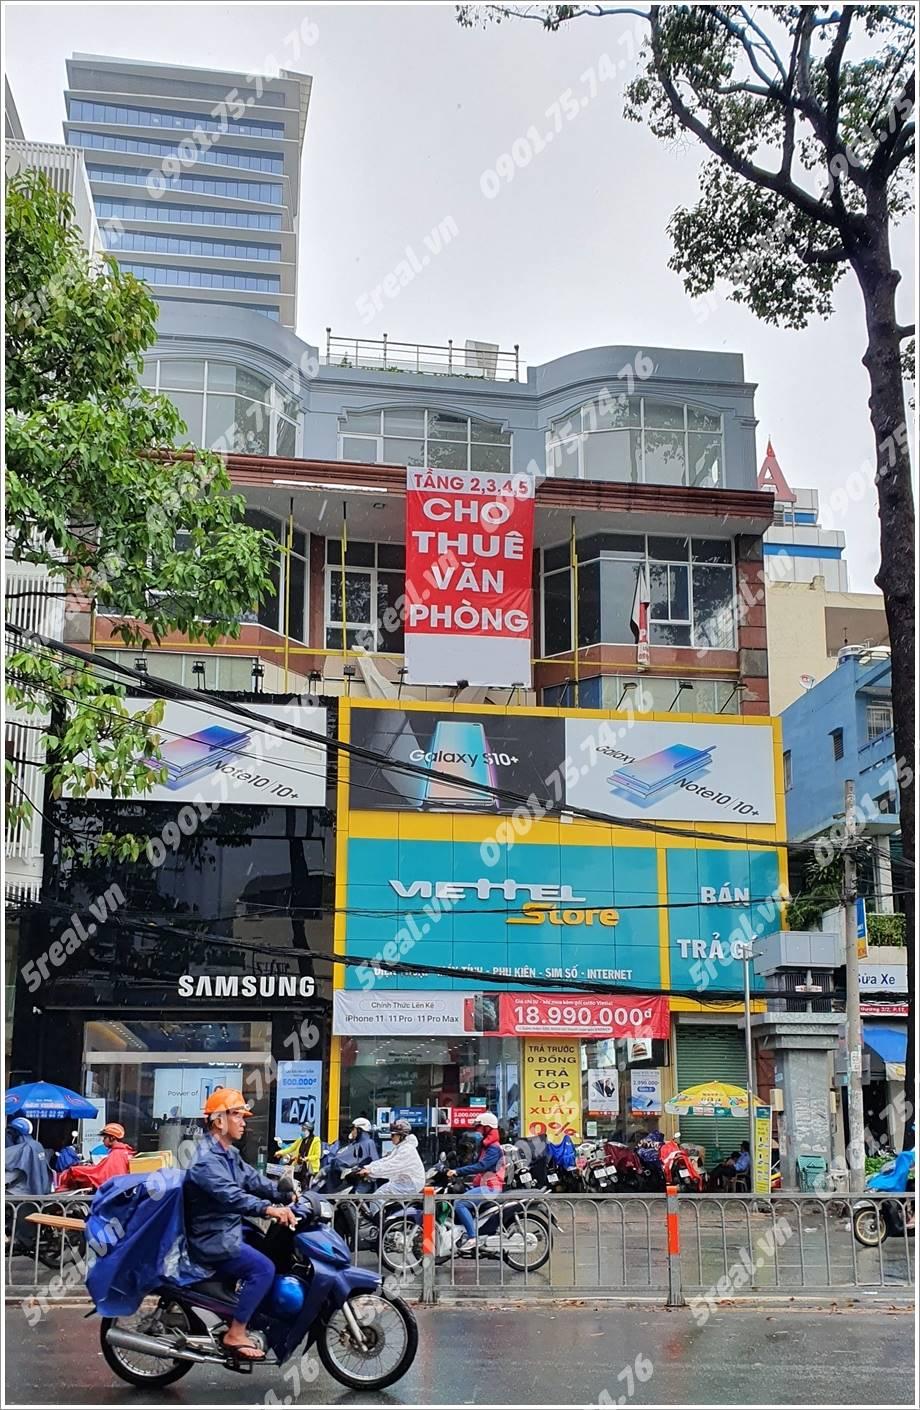 viettel-store-ba-thang-hai-quan-10-van-phong-cho-thue-5real.vn-01